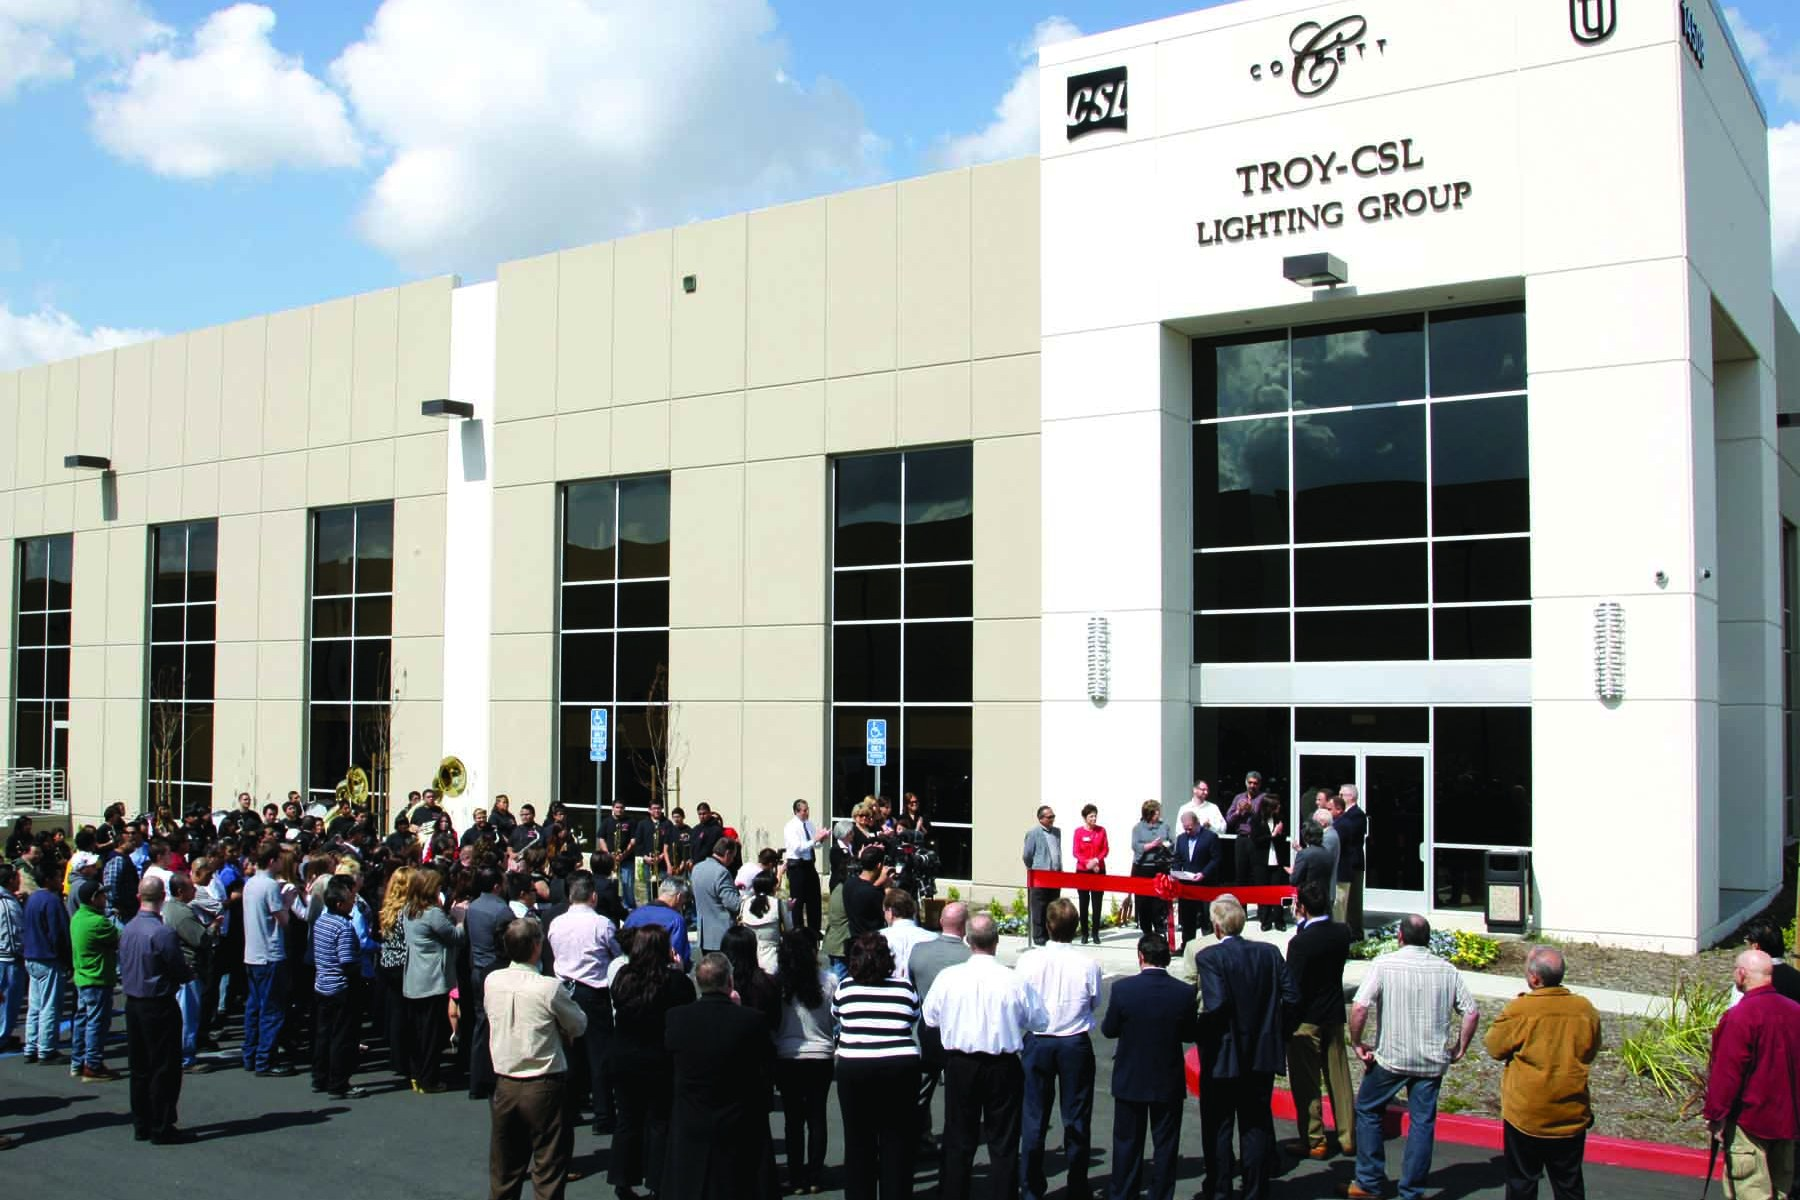 Littman Group Expands Headquarters